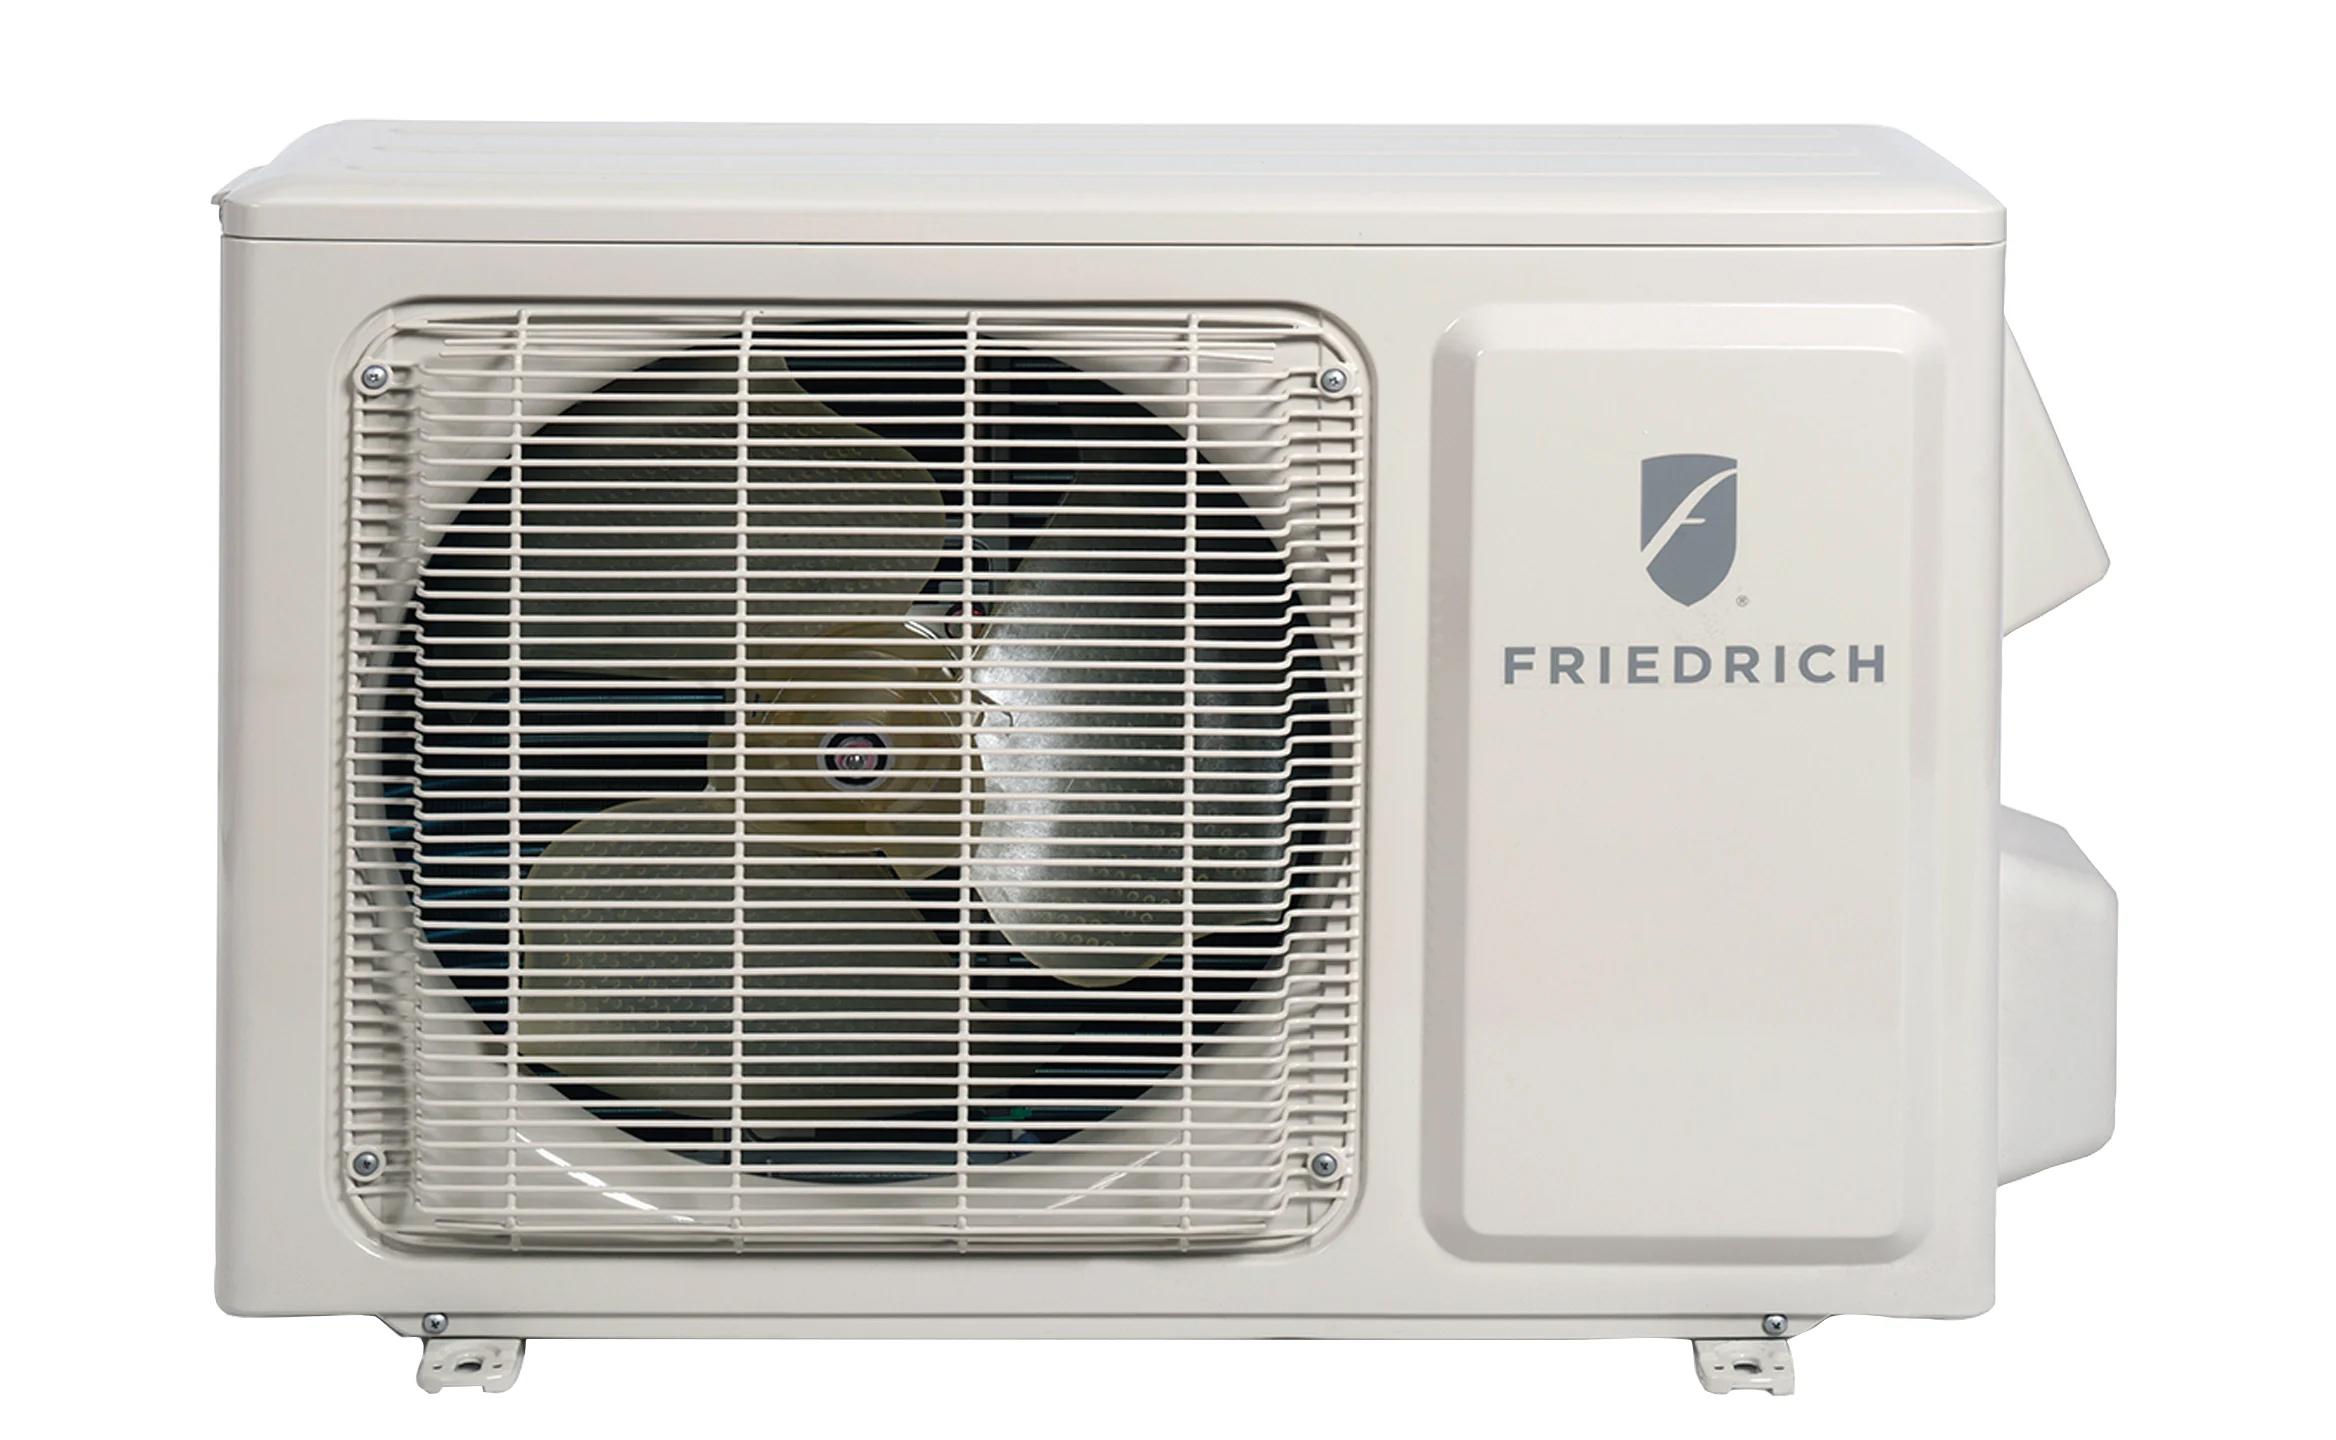 Friedrich FSHSR12A1A 12000 BTU Floating Air Select Series Outdoor Unit